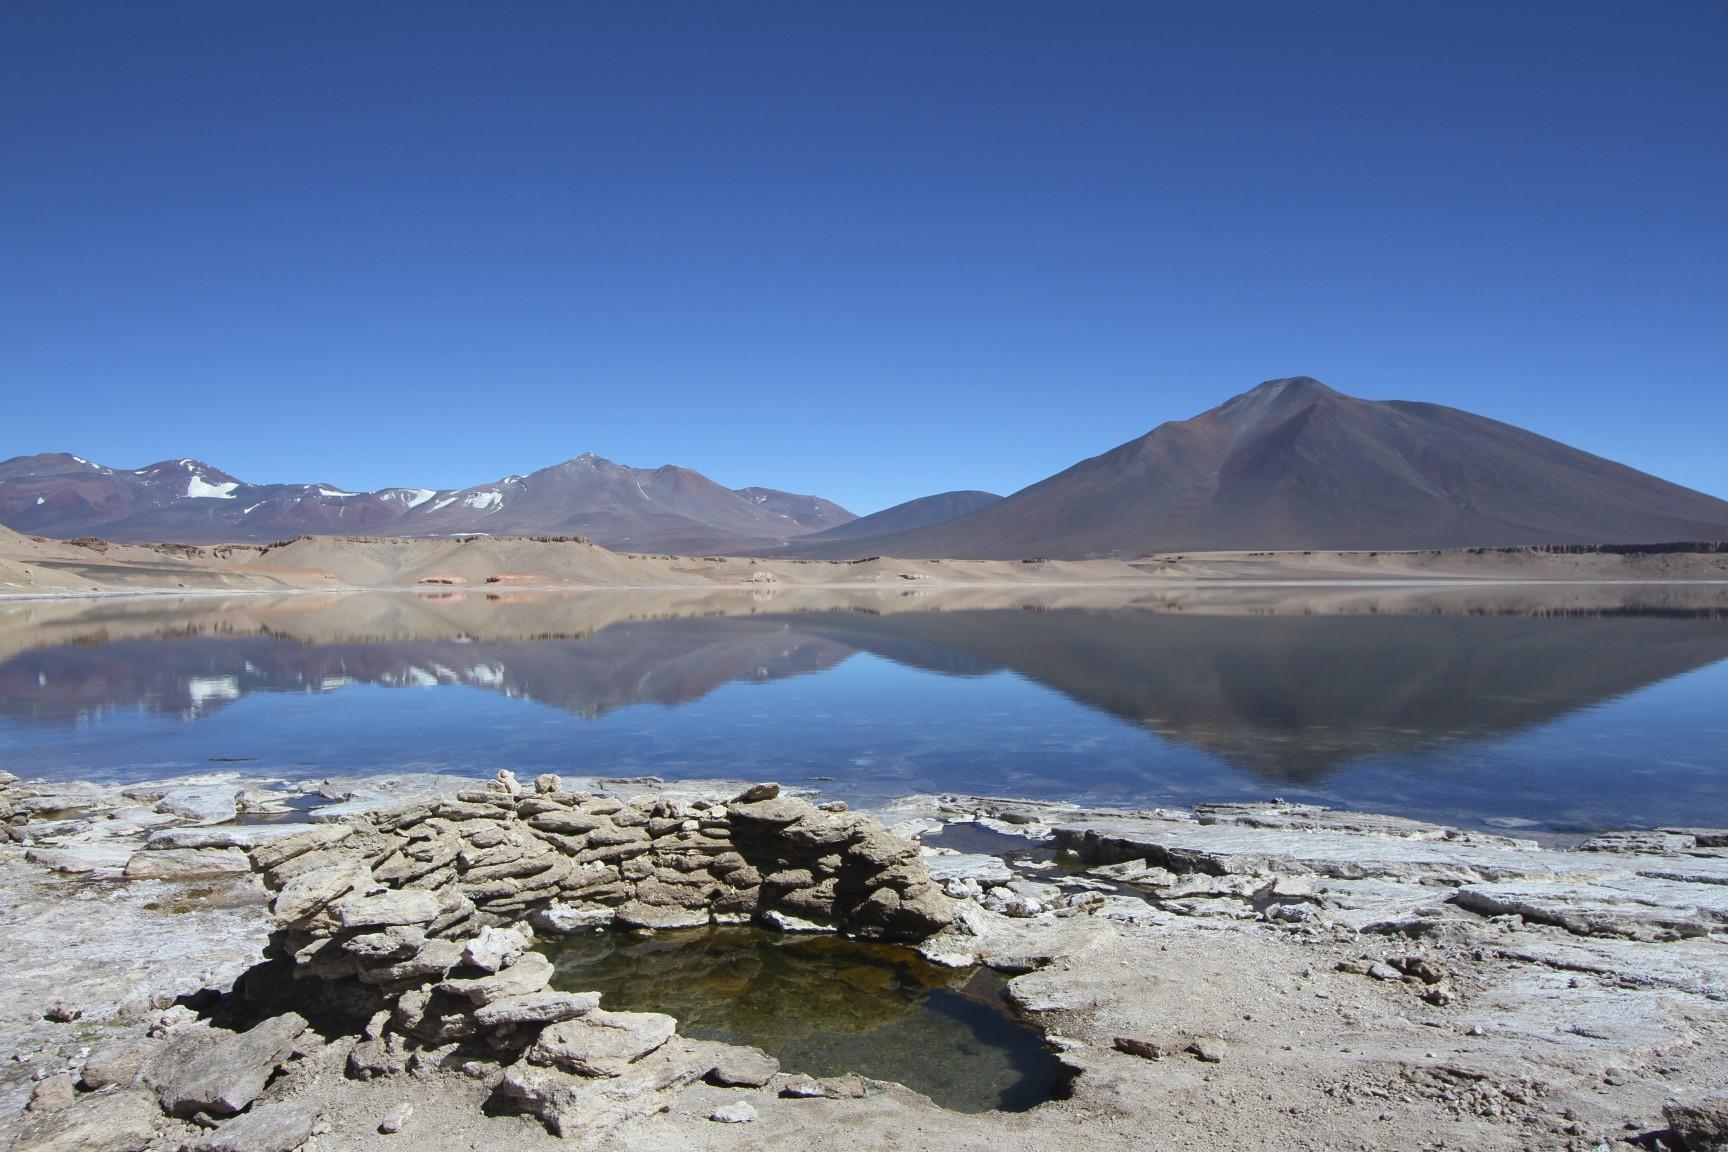 Nacional: Parque Nacional De Tres Cruces